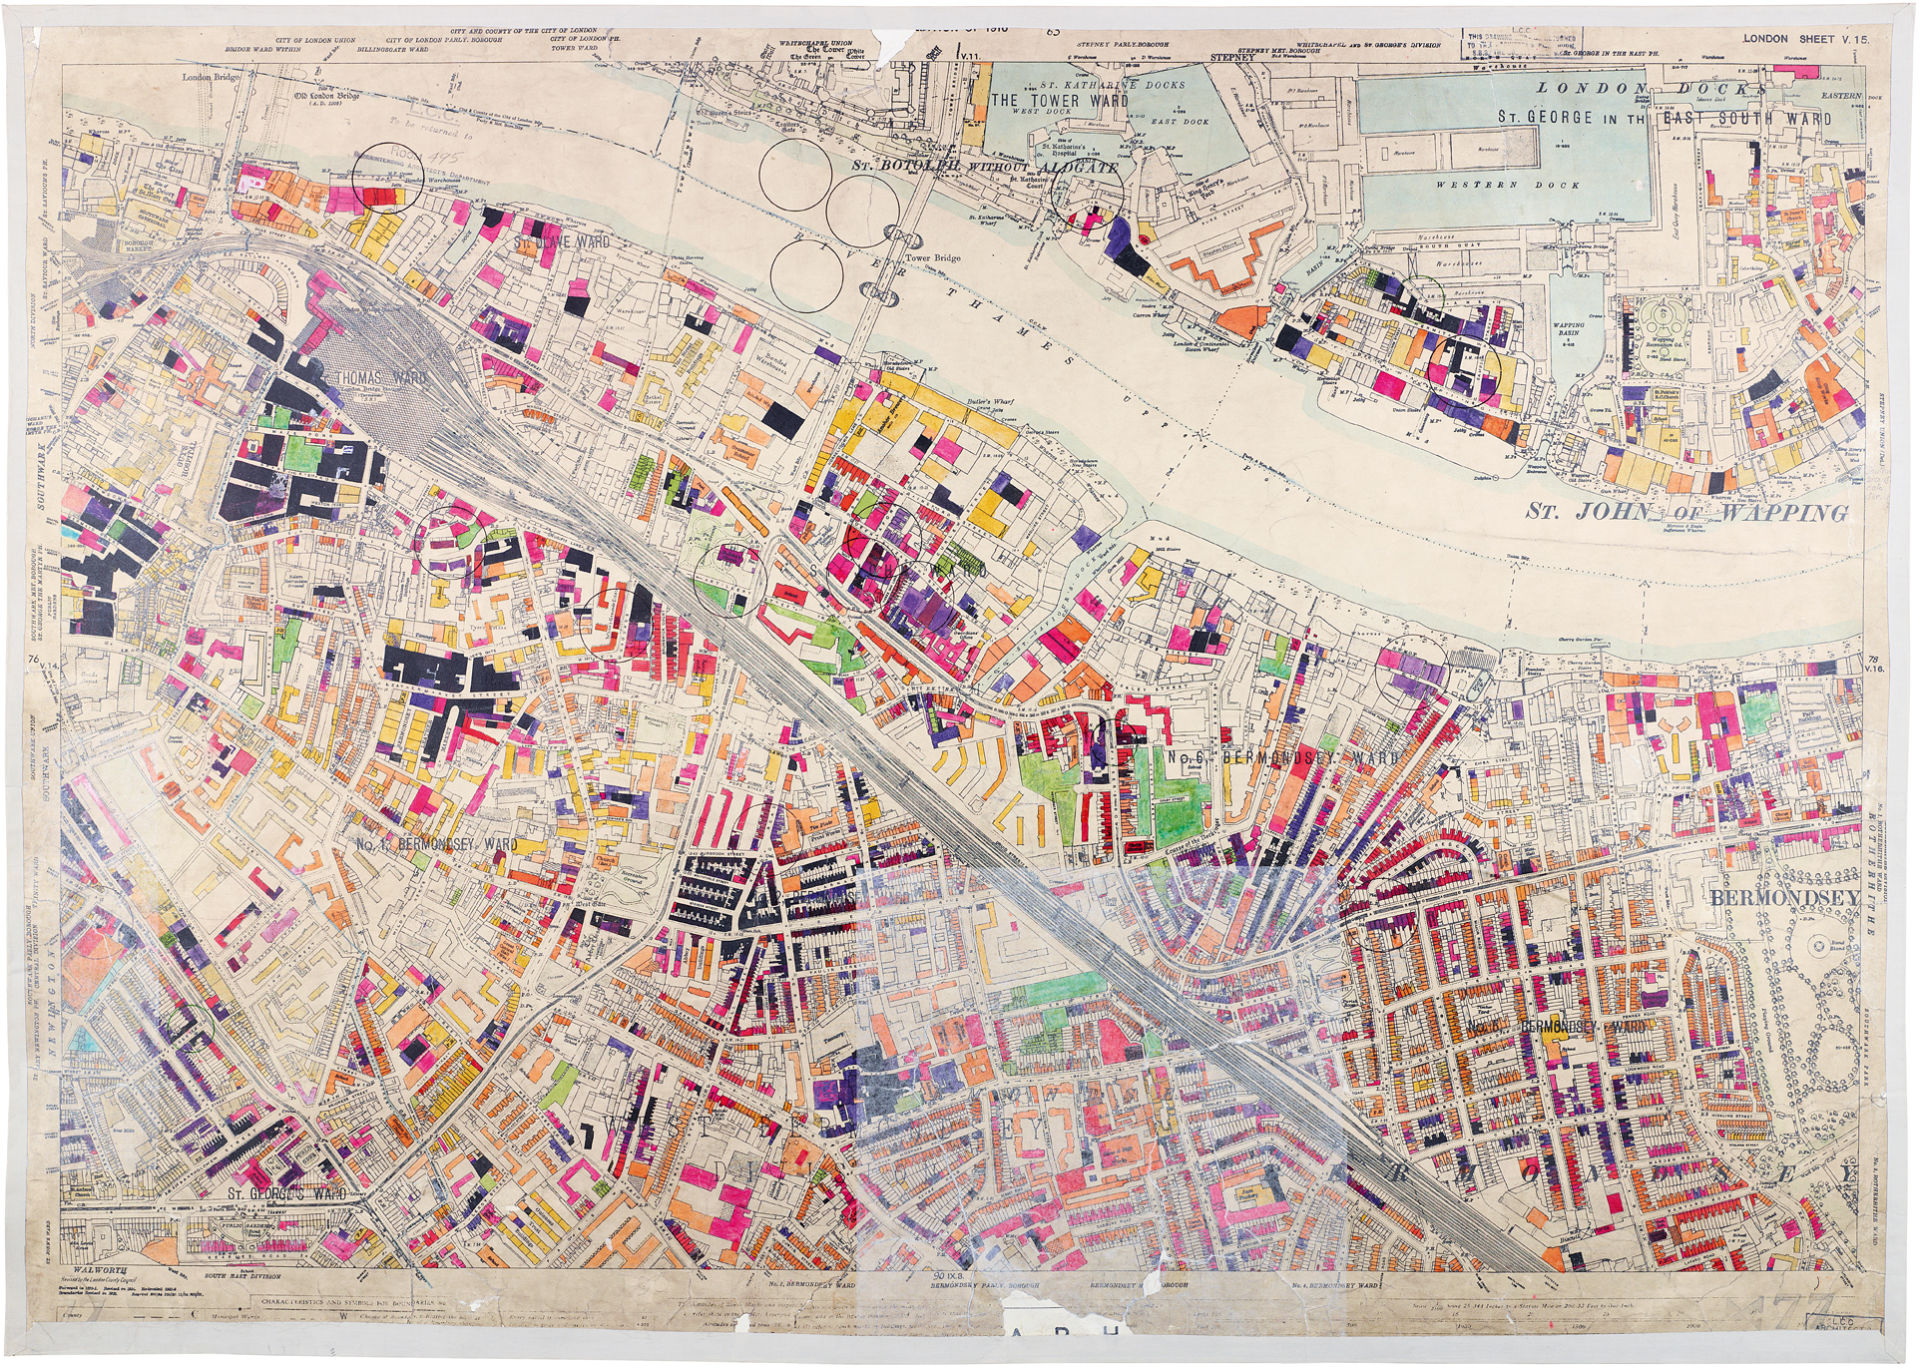 Bermondsey; Wapping 1920x1369